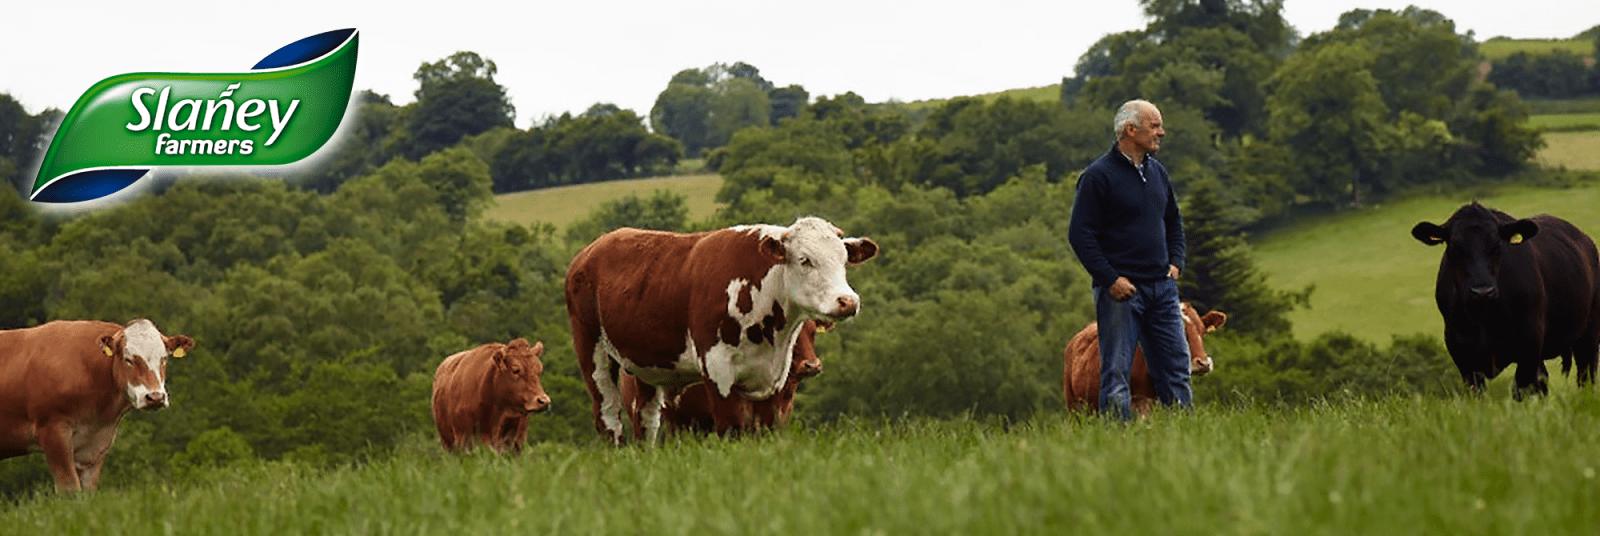 Slaney Farmers